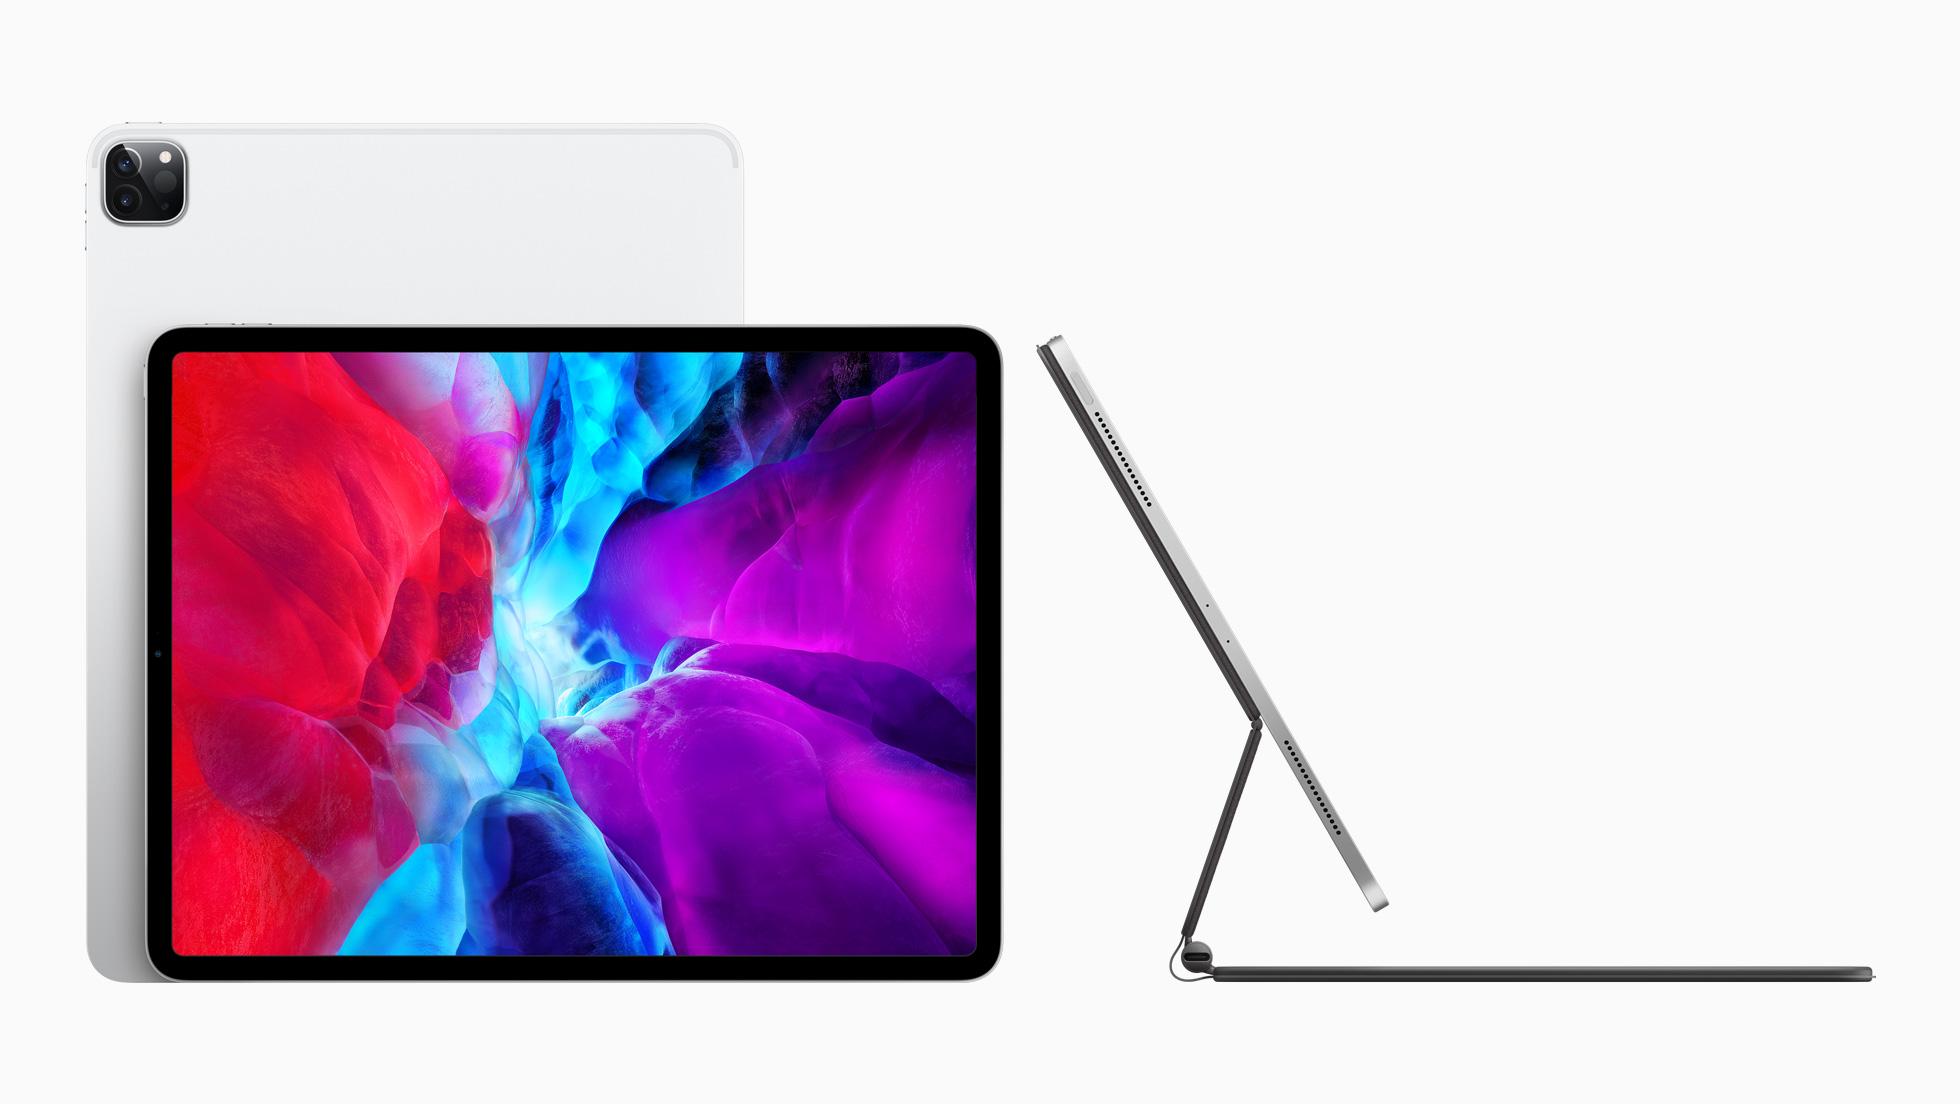 iPad Pro - Image Credit: Apple